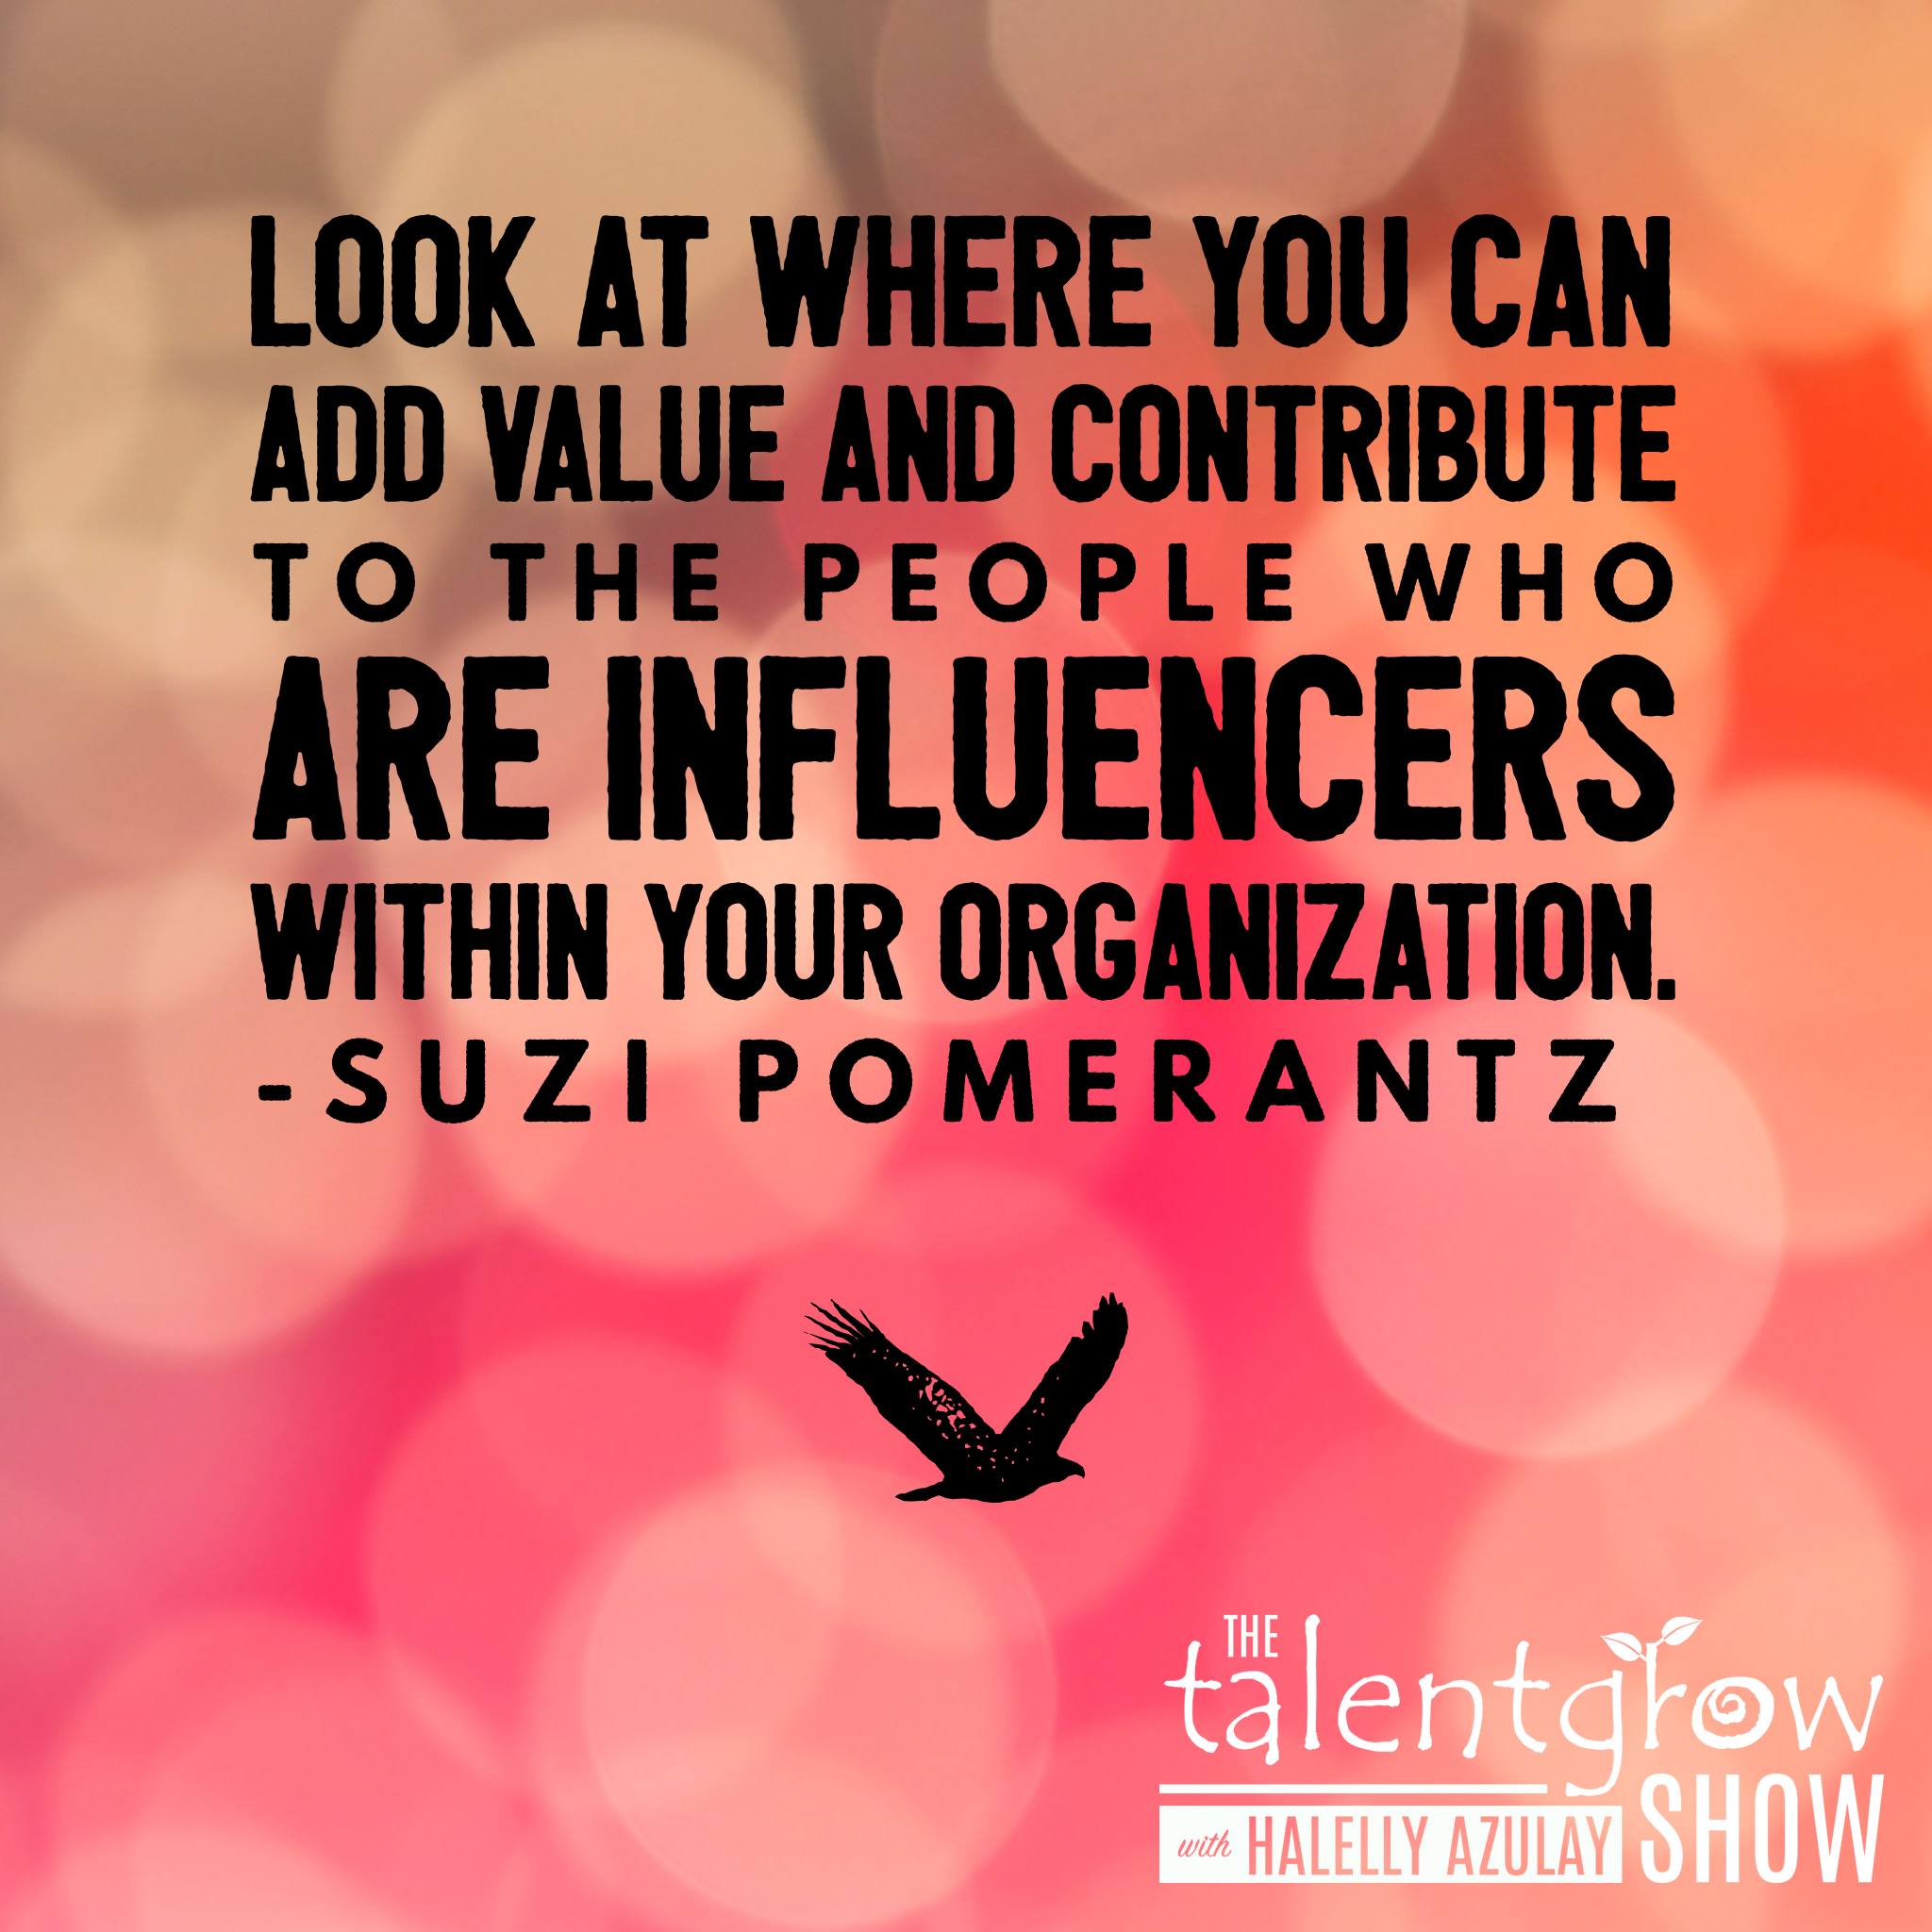 Strategic career relationship tips from Master Executive Coach Suzi Pomerantz on the TalentGrow Show podcast with Halelly Azulay